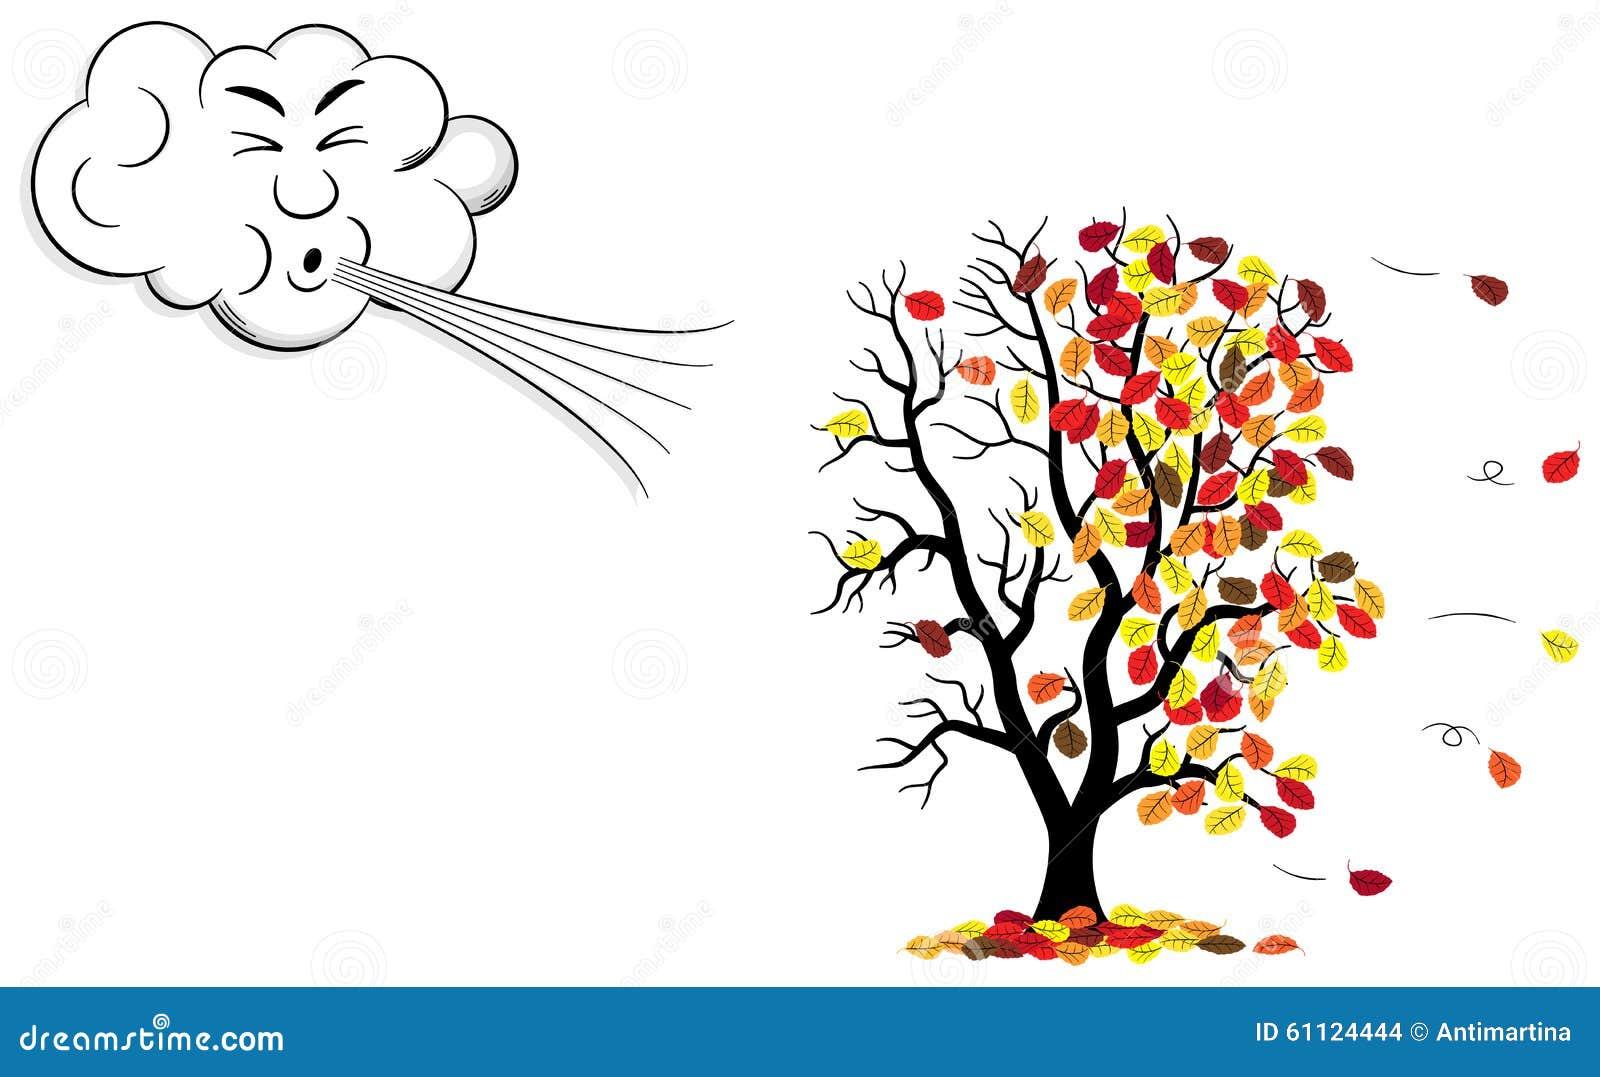 Nuage de bande dessin e qui souffle le vent un arbre qui - Nuage qui souffle ...